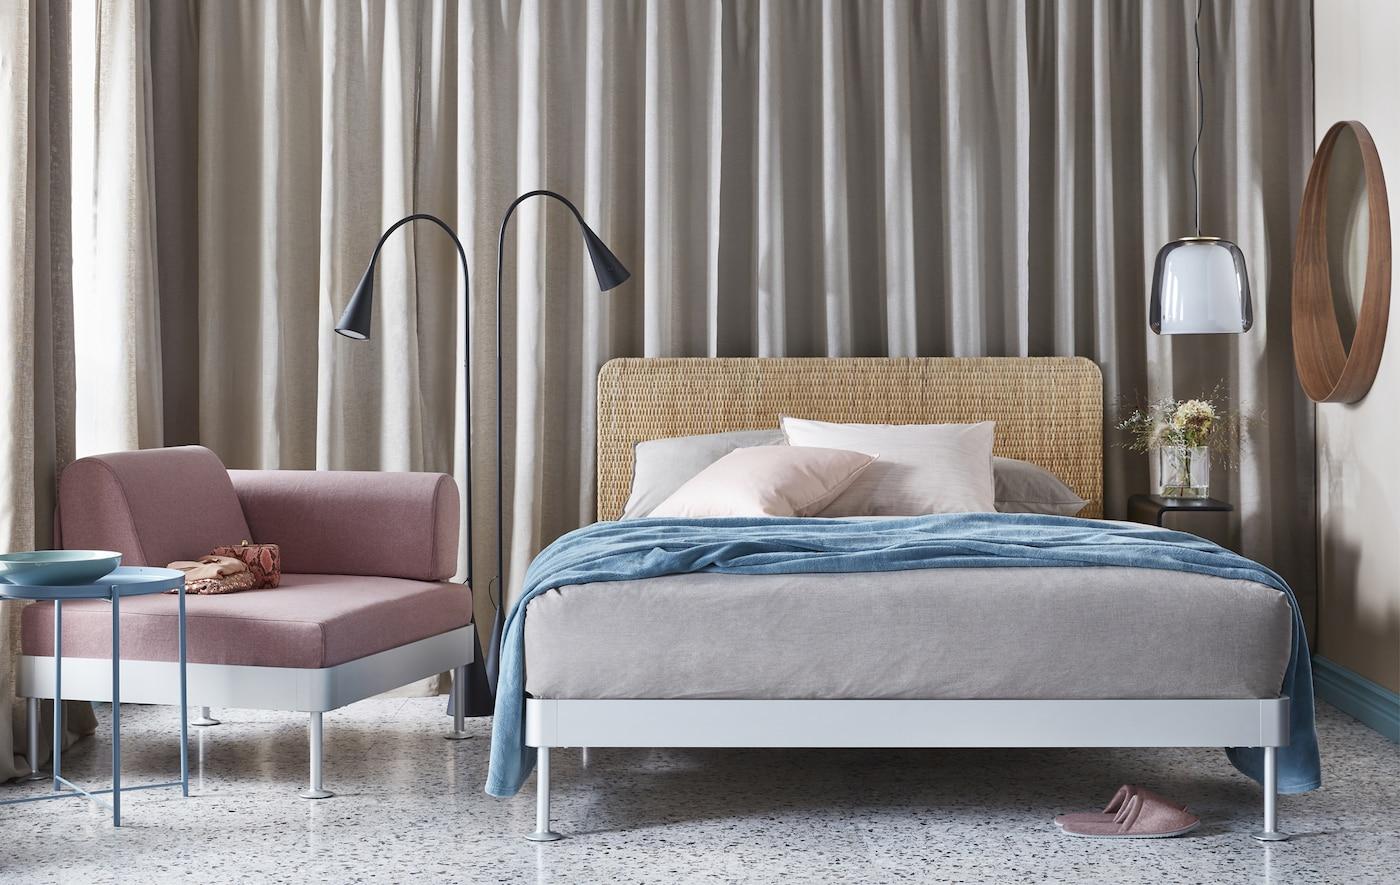 Spavaća soba neutralno sive, bež i roze boje, s francuskim krevetom, podnom lampom, foteljom i pomoćnim stočićem.